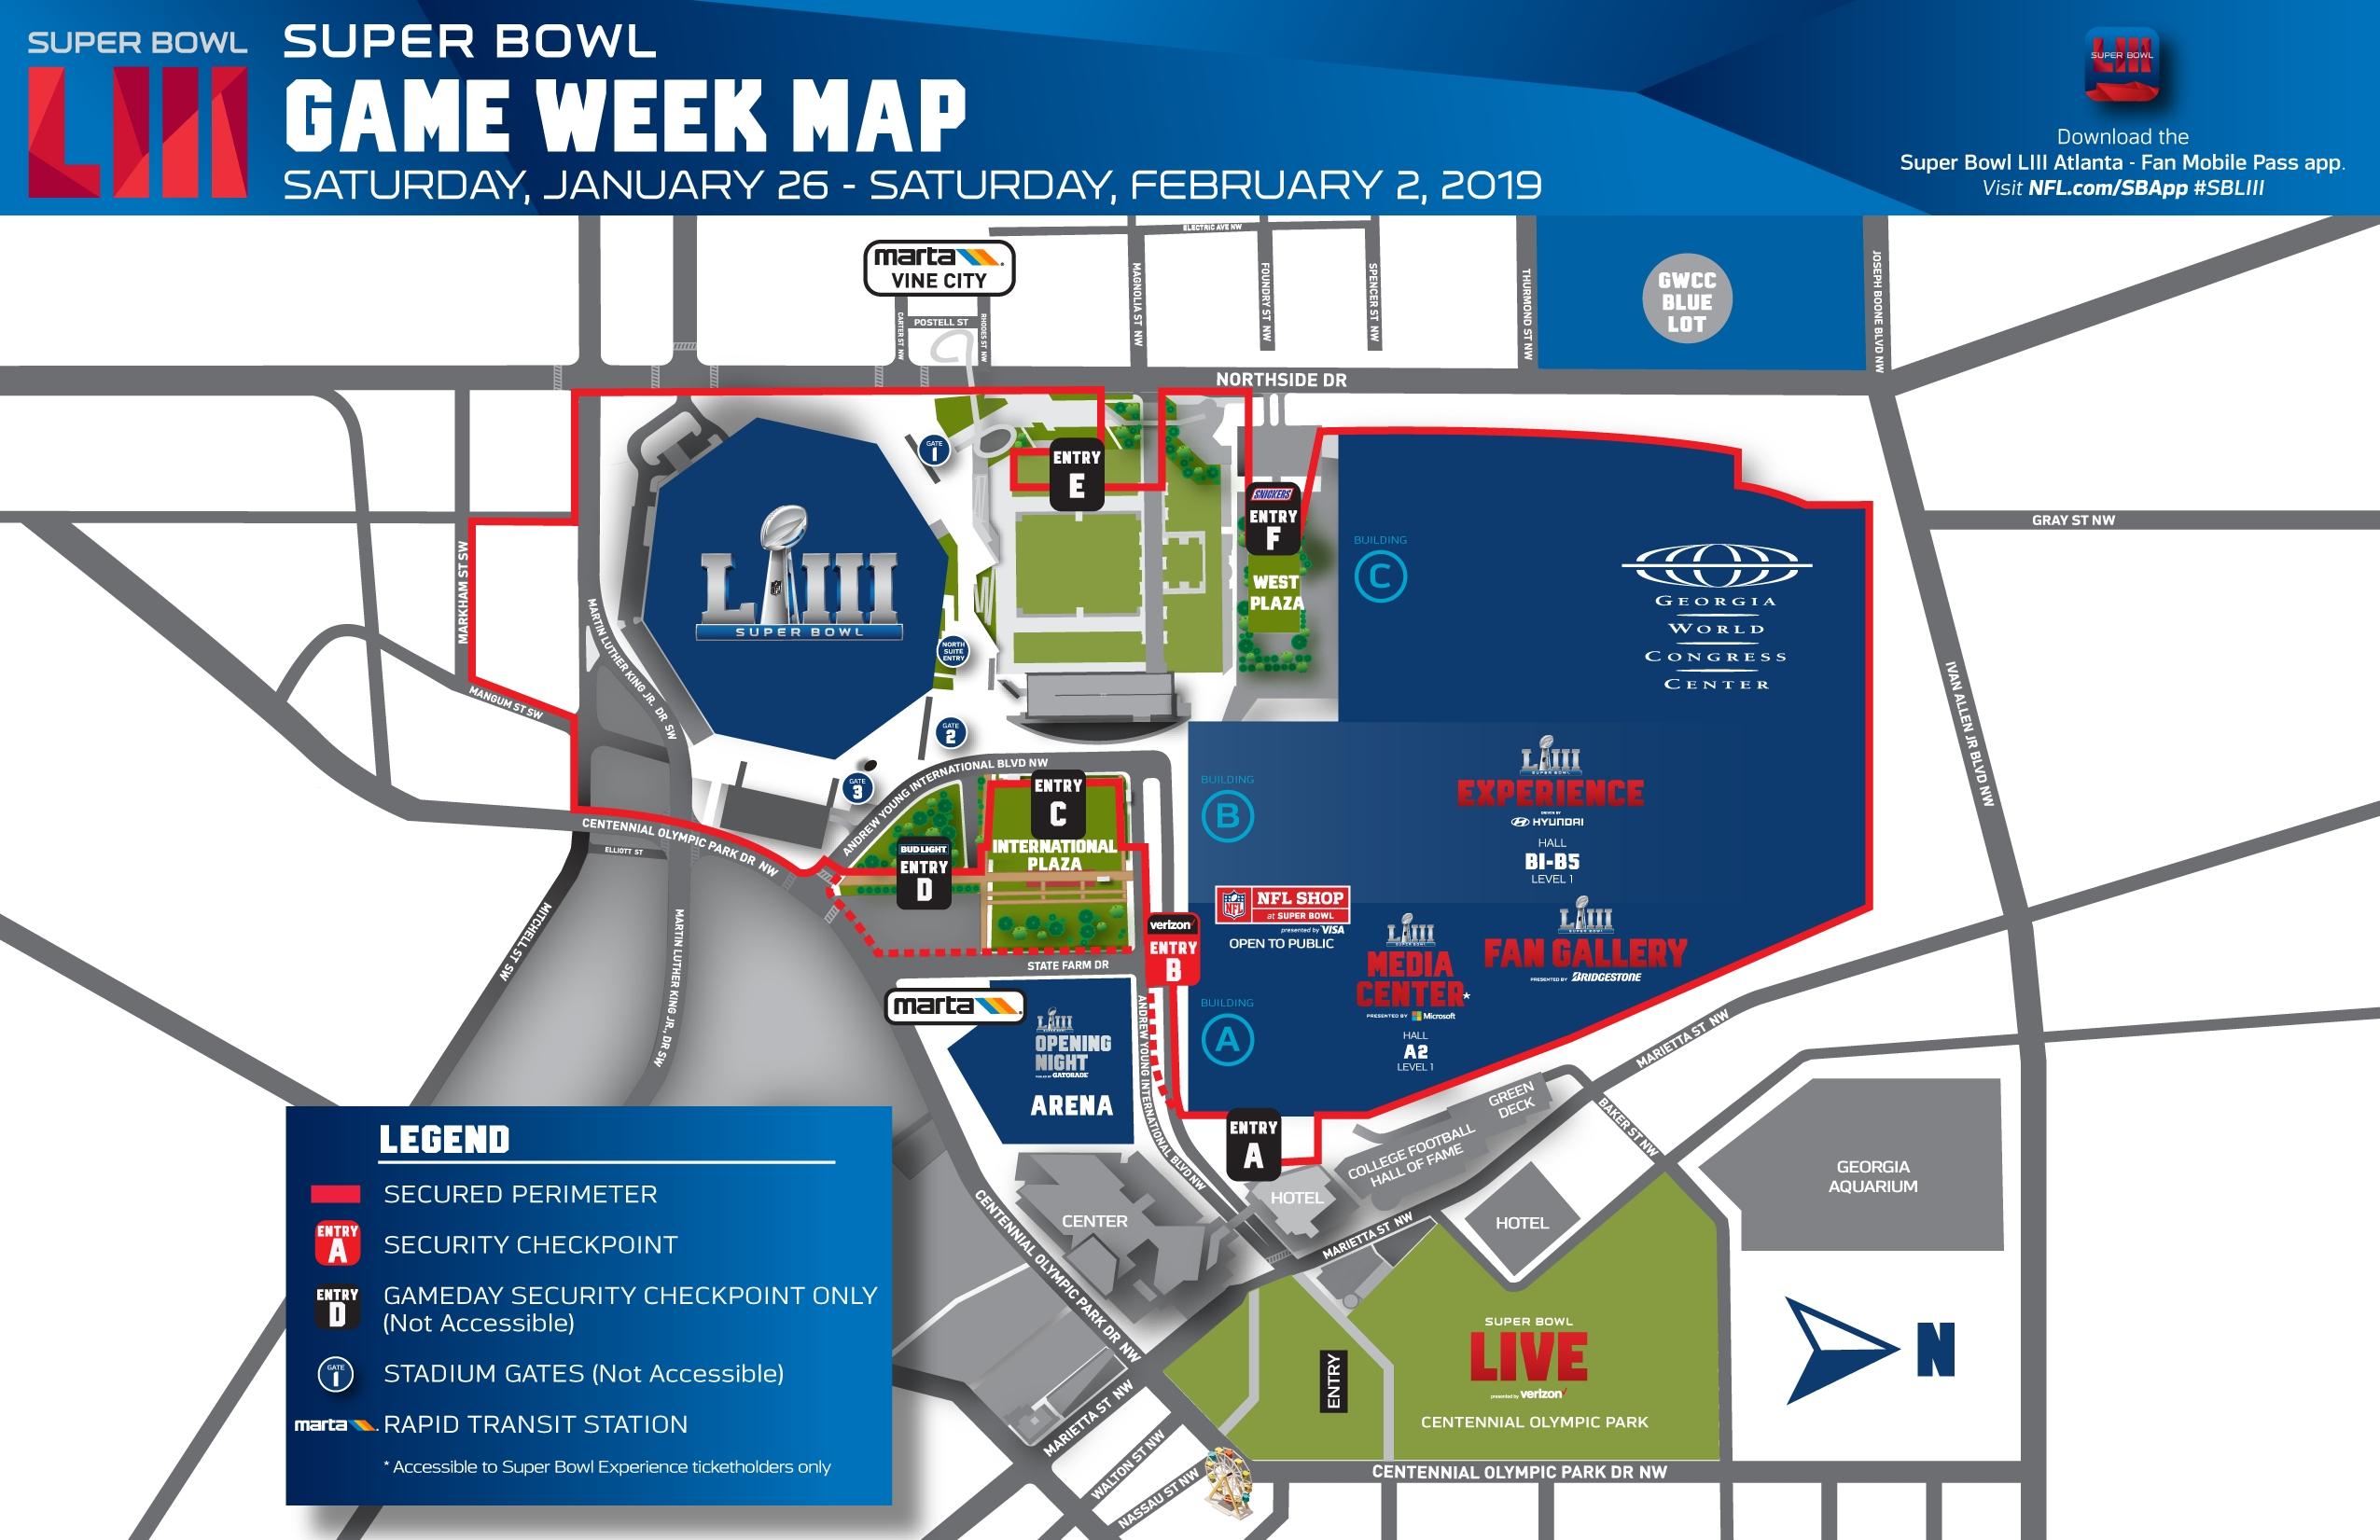 Super Bowl Hub - Mercedes Benz Stadium throughout Mercedes Benz Stadium Seating Chart For Super Bowl